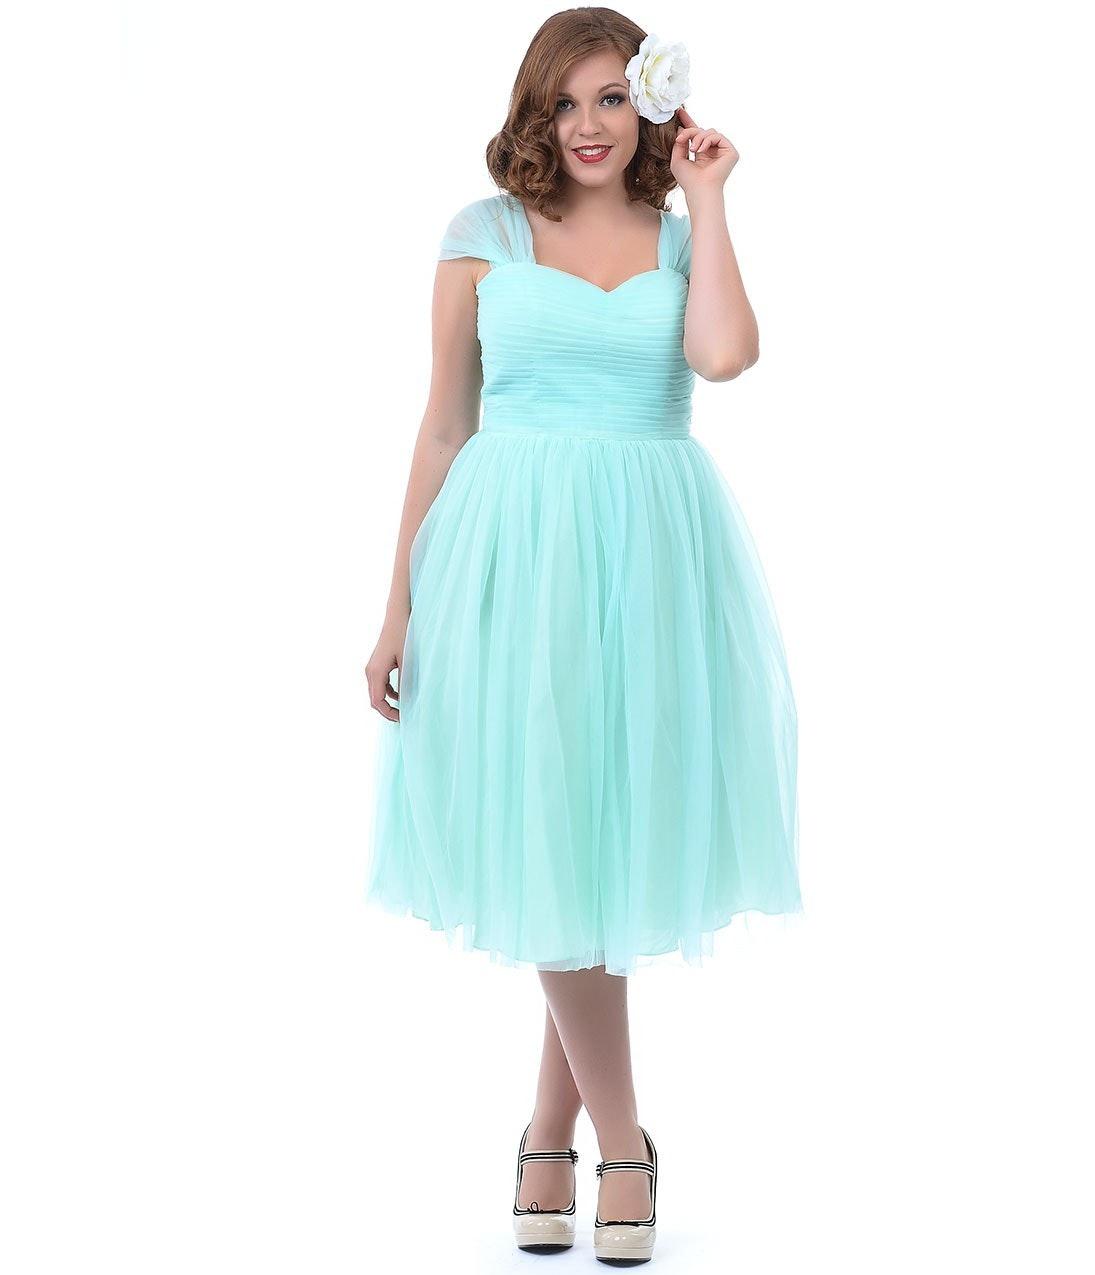 Blue dress h&m 16th street